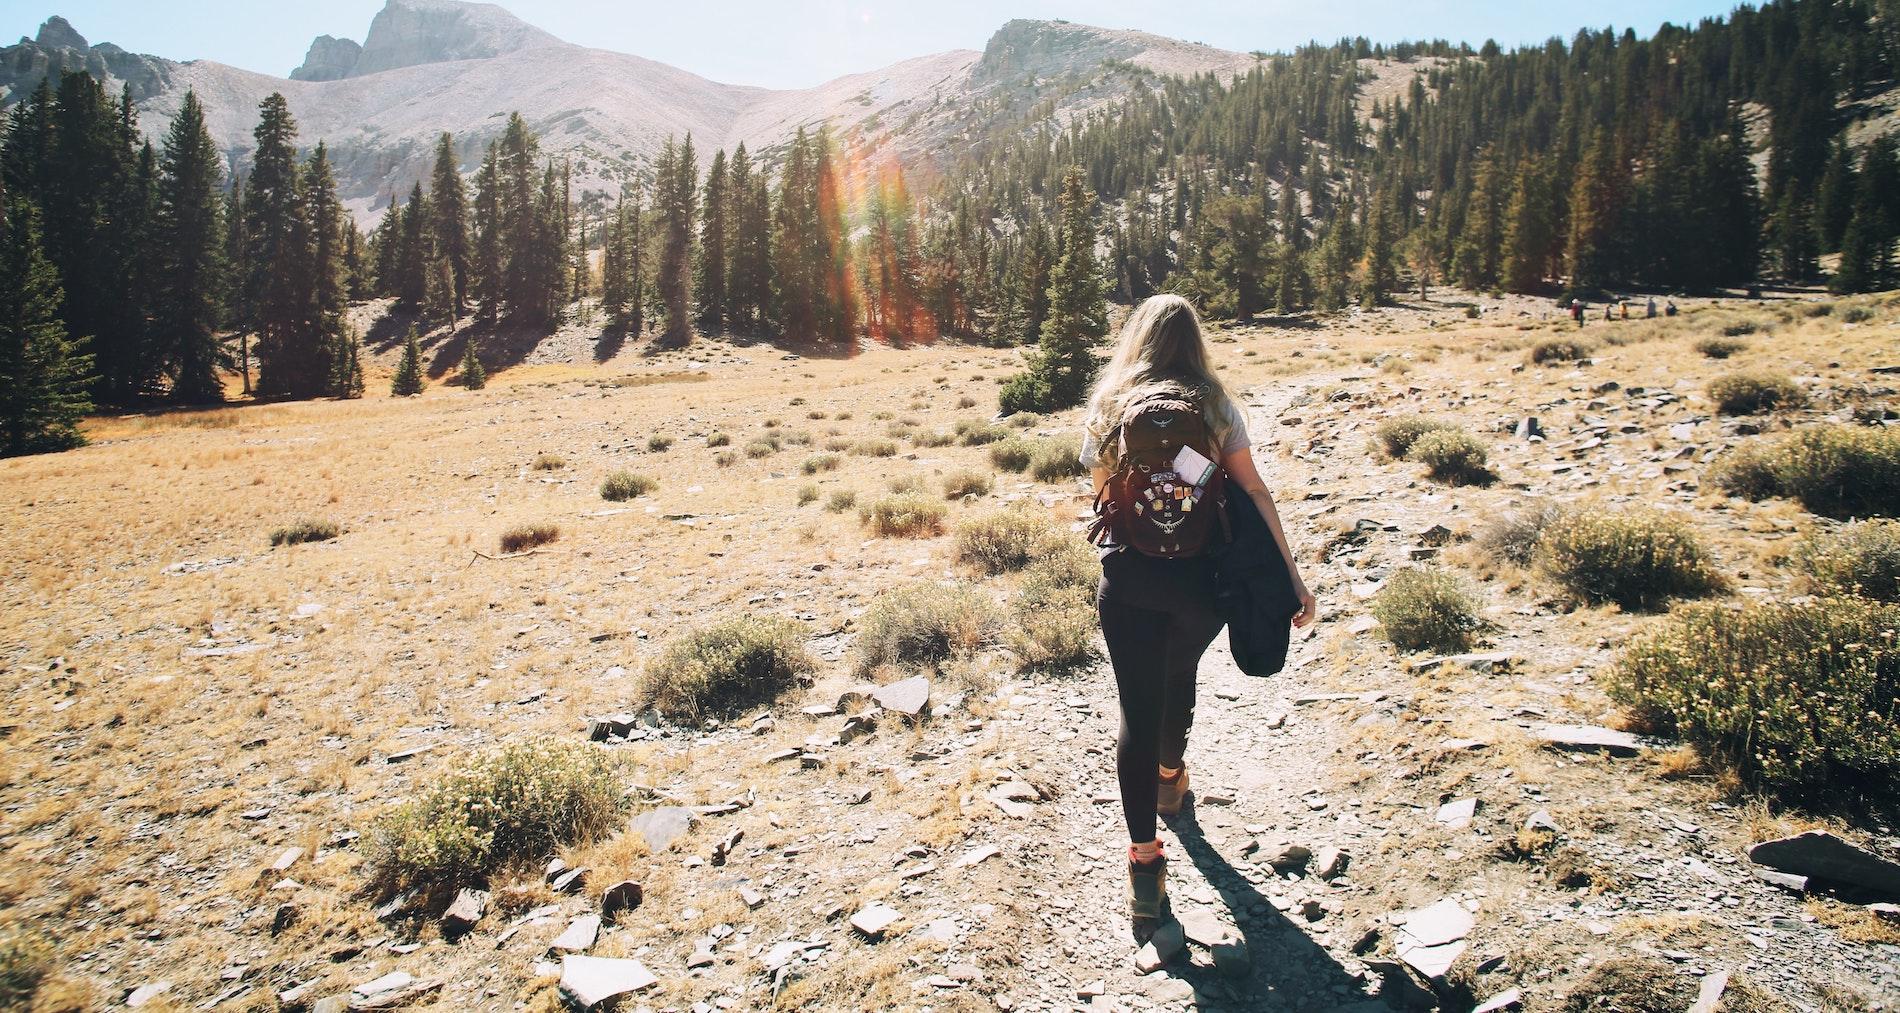 summer sun hiking and camping